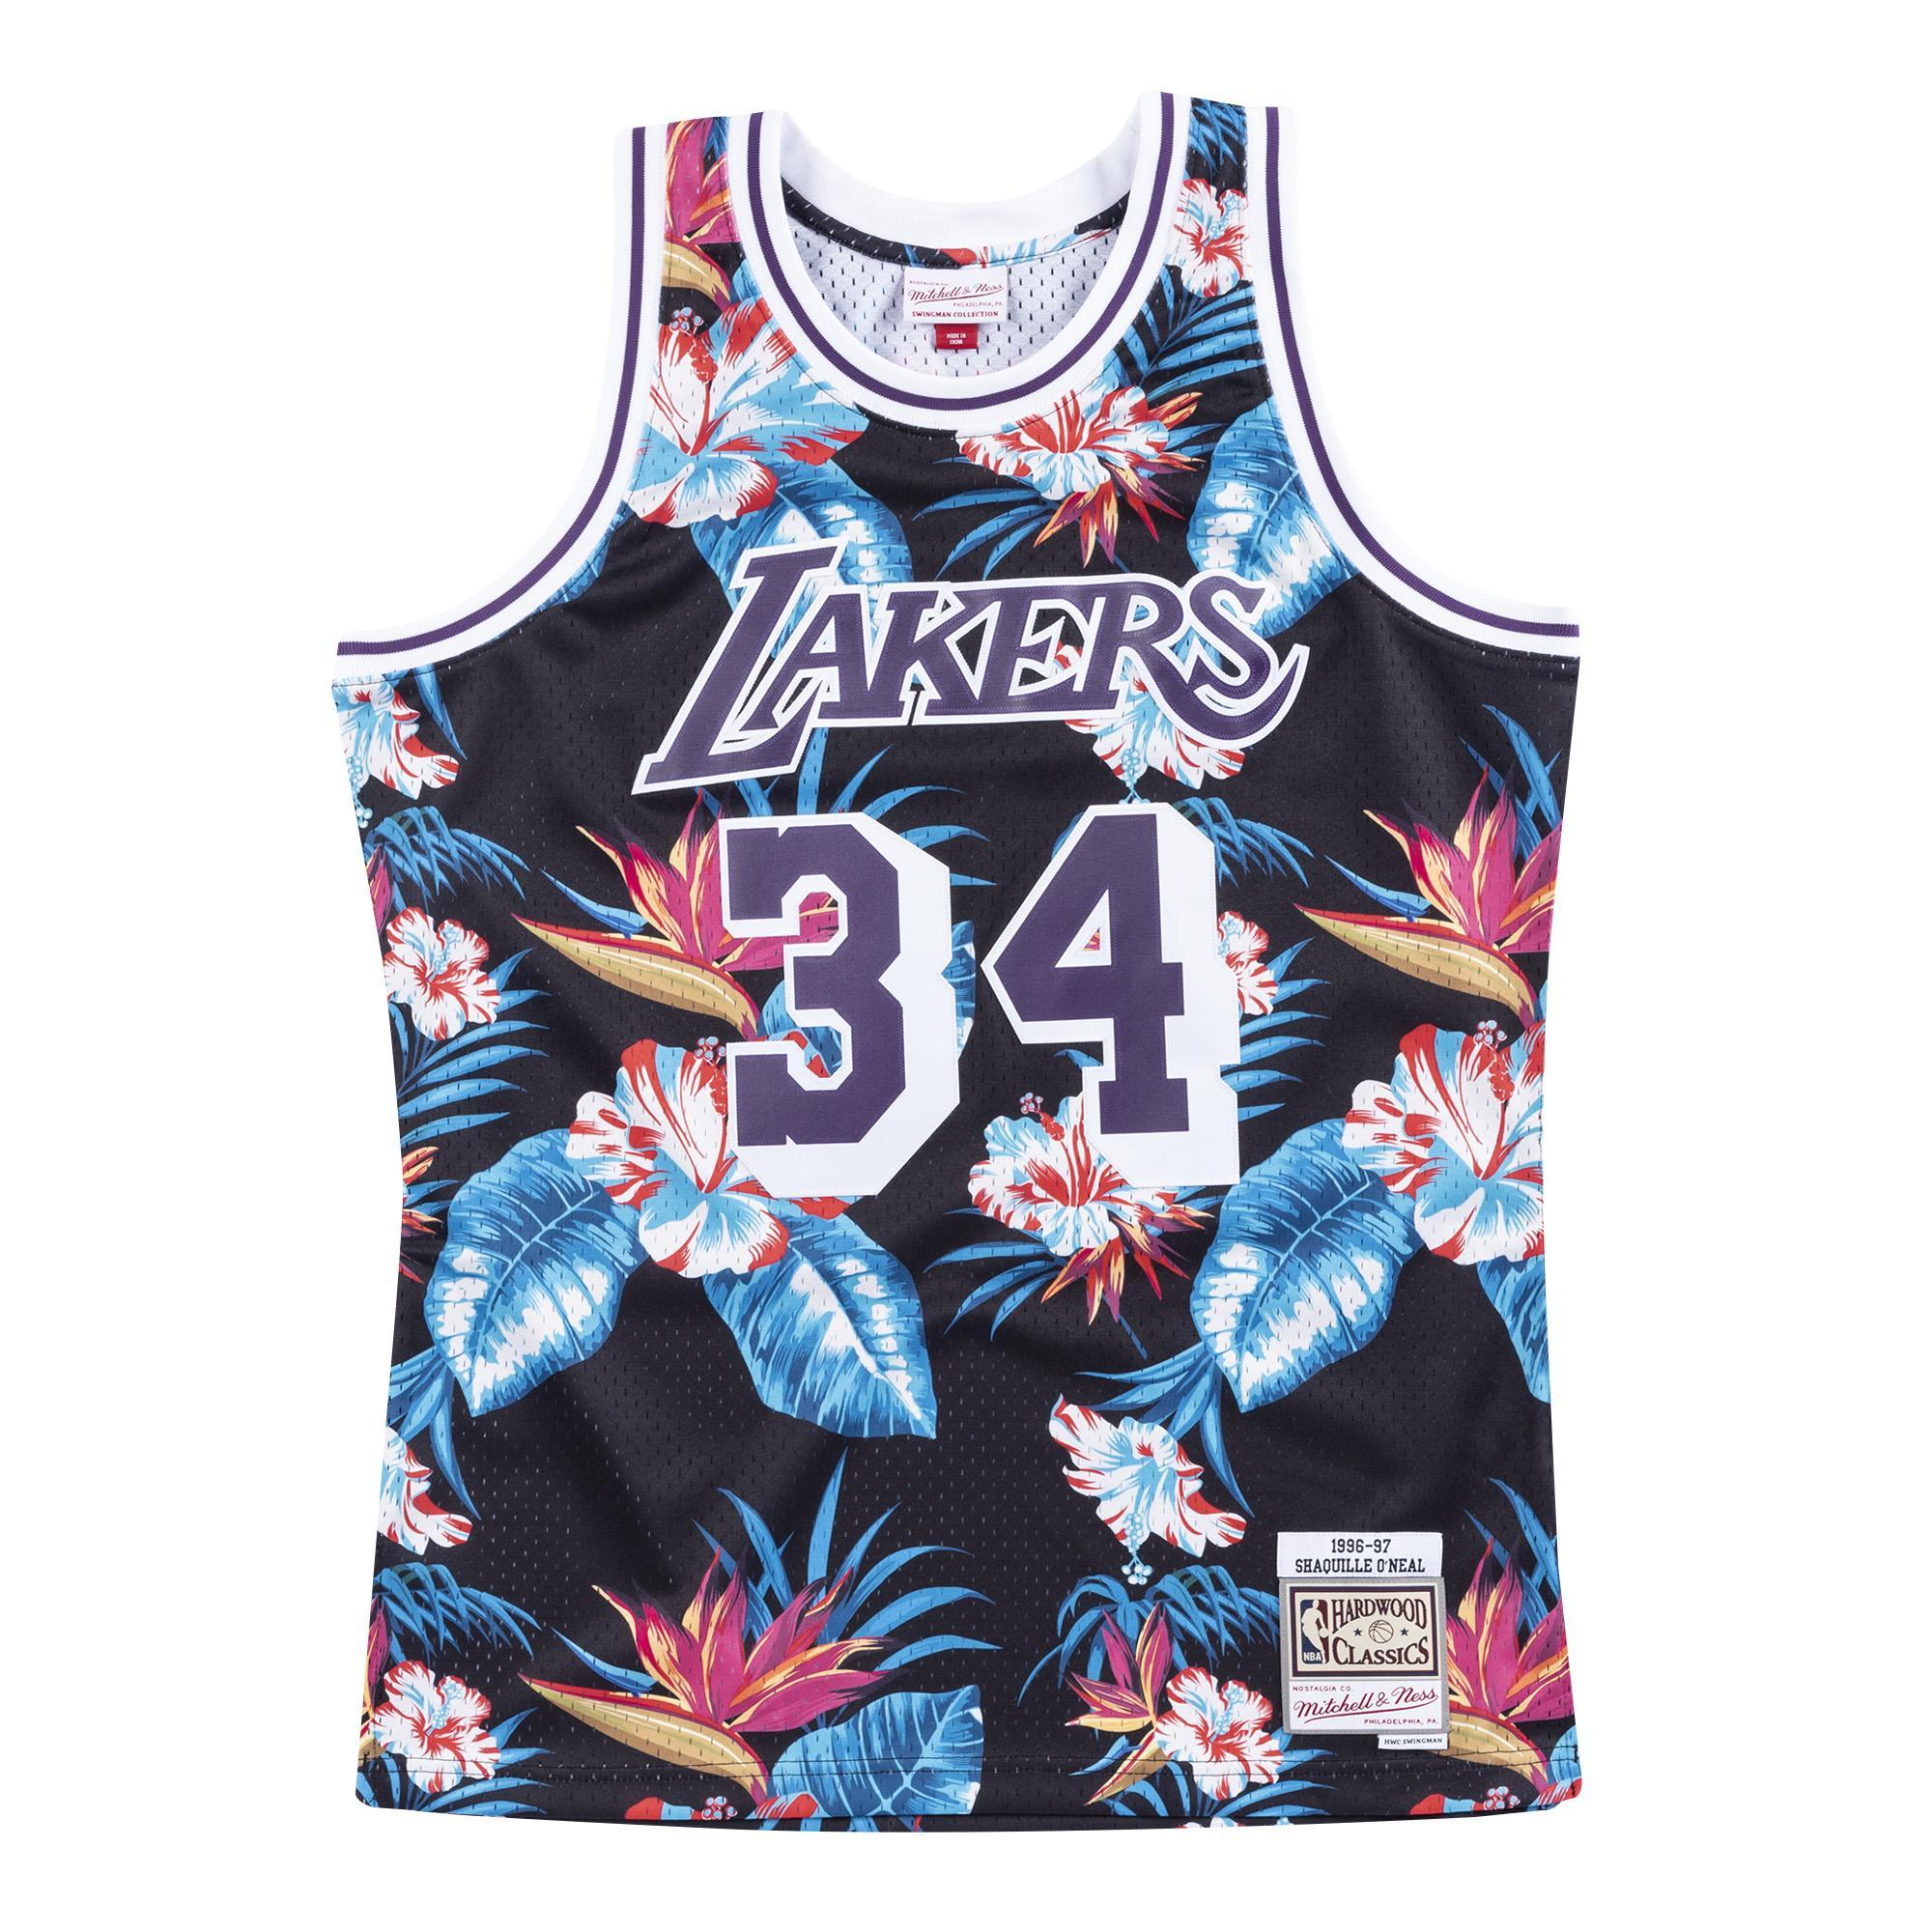 watch df9a3 16745 Mitchell & Ness | LA Lakers Floral Black Swingman Jersey ...